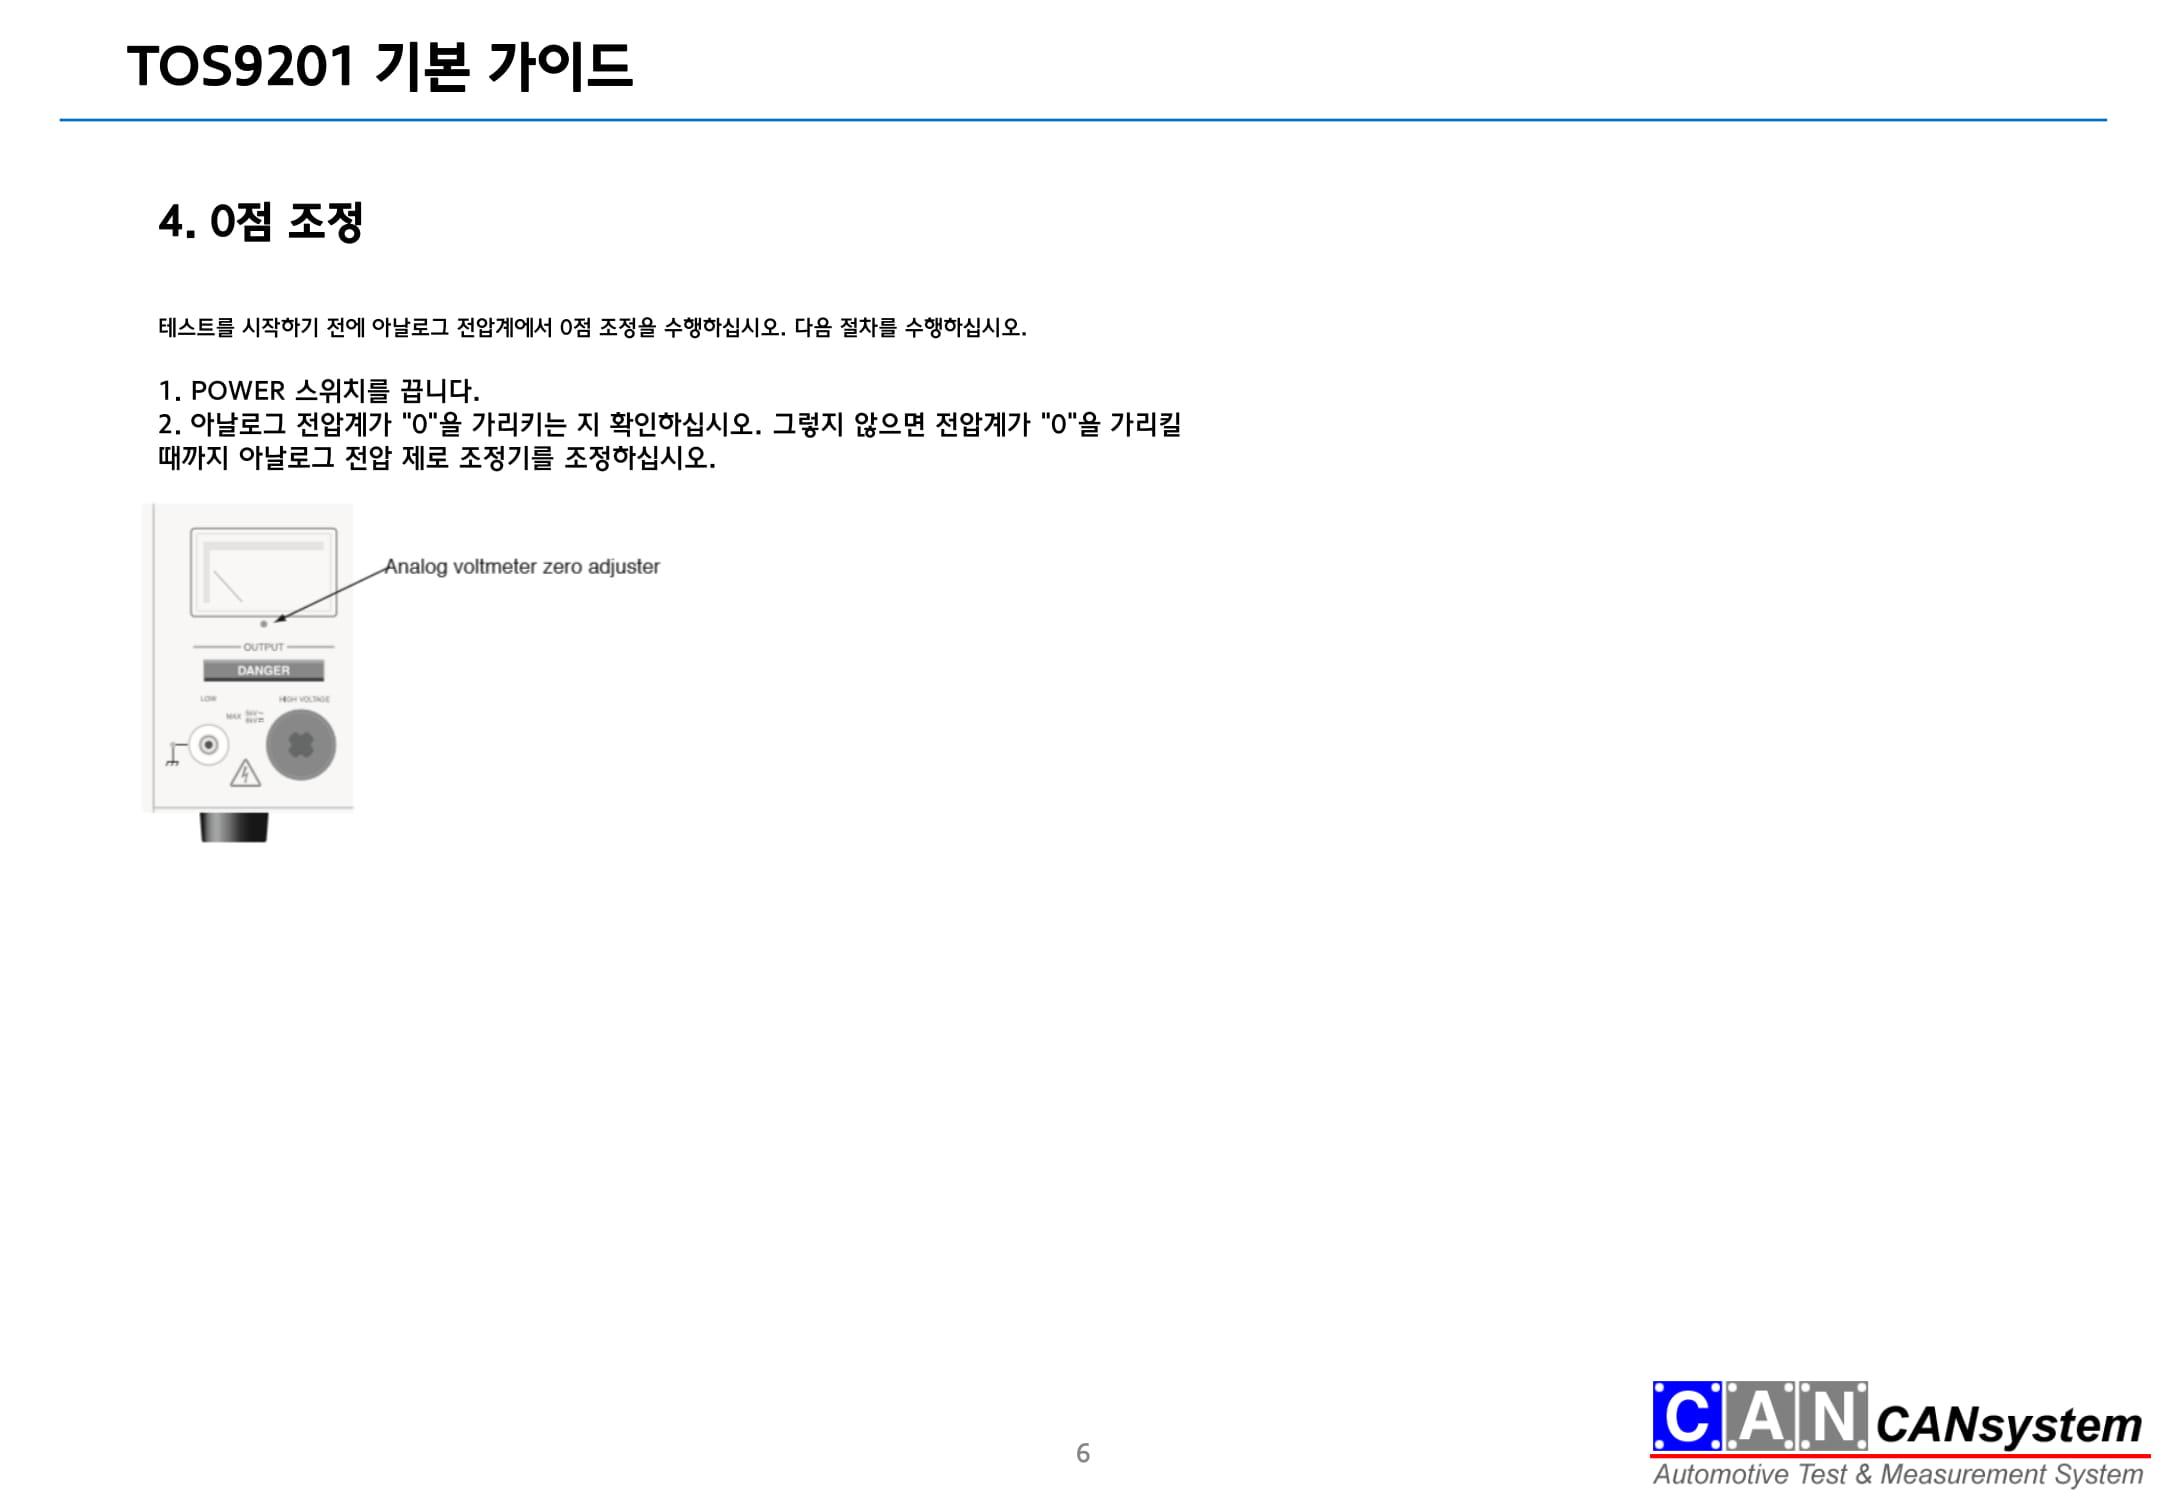 KIKUSUI TOS9201 국문 이용가이드-06.jpg